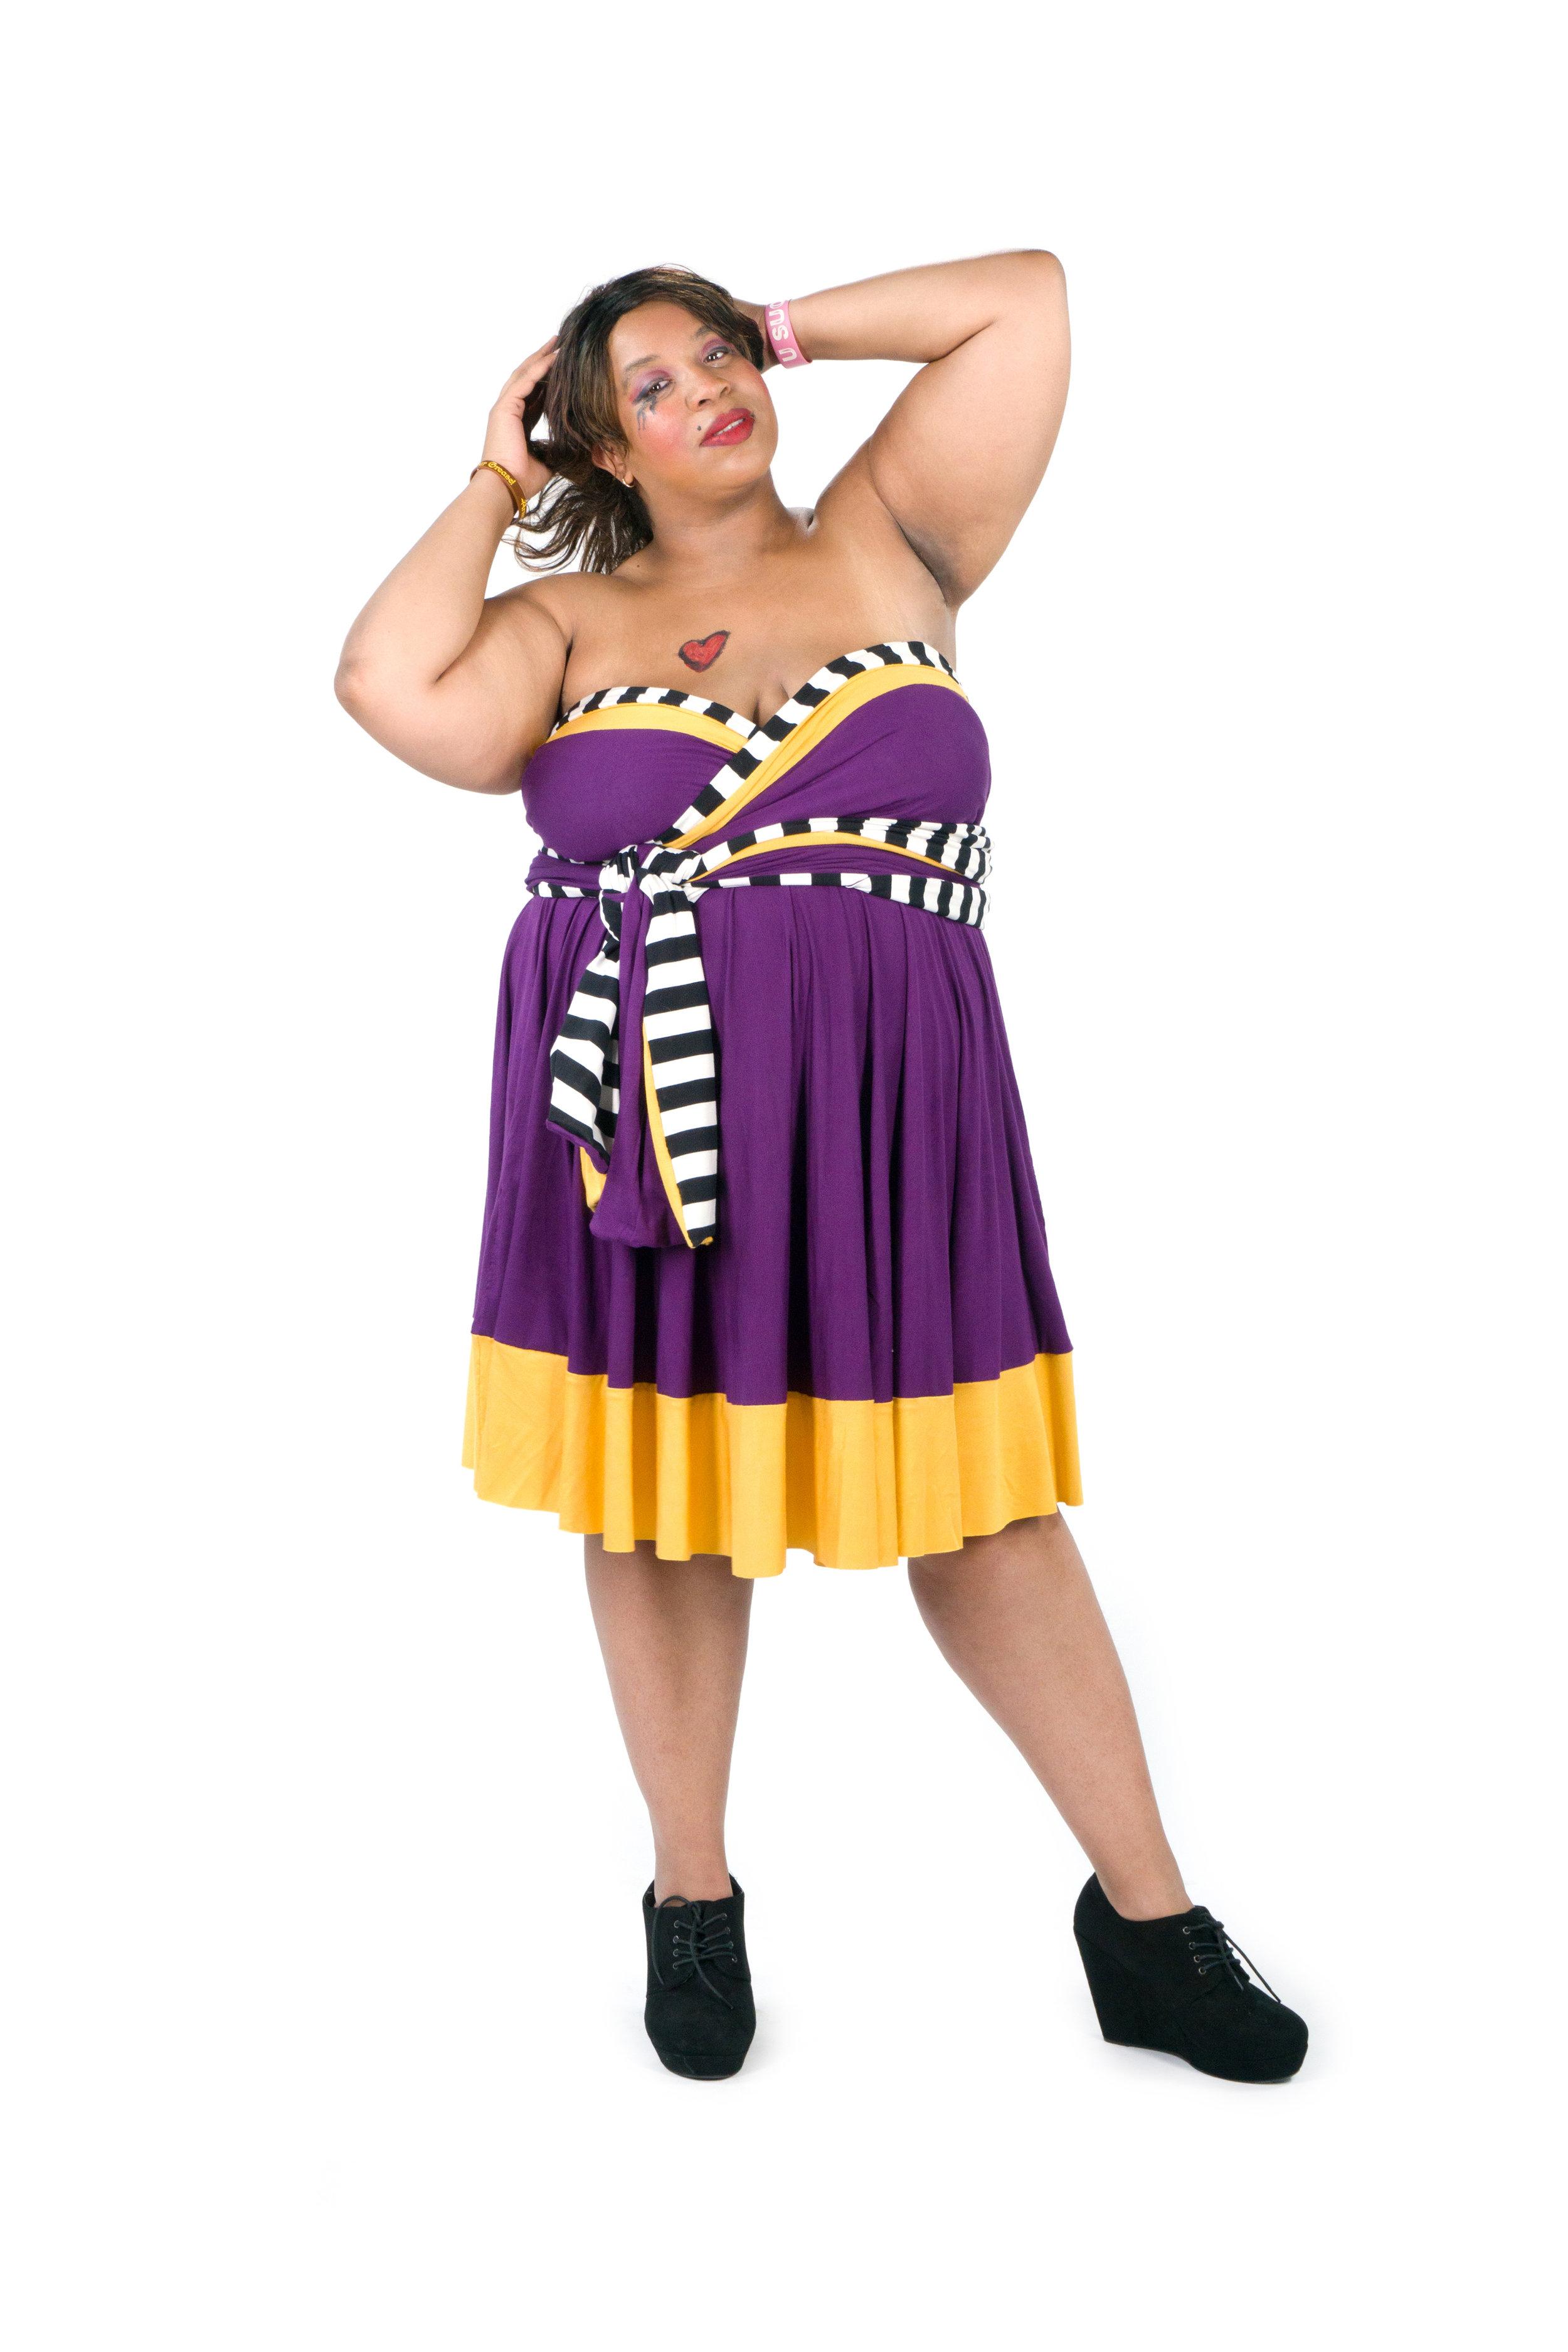 Pandora Barkeep Inspired Convertible Dress